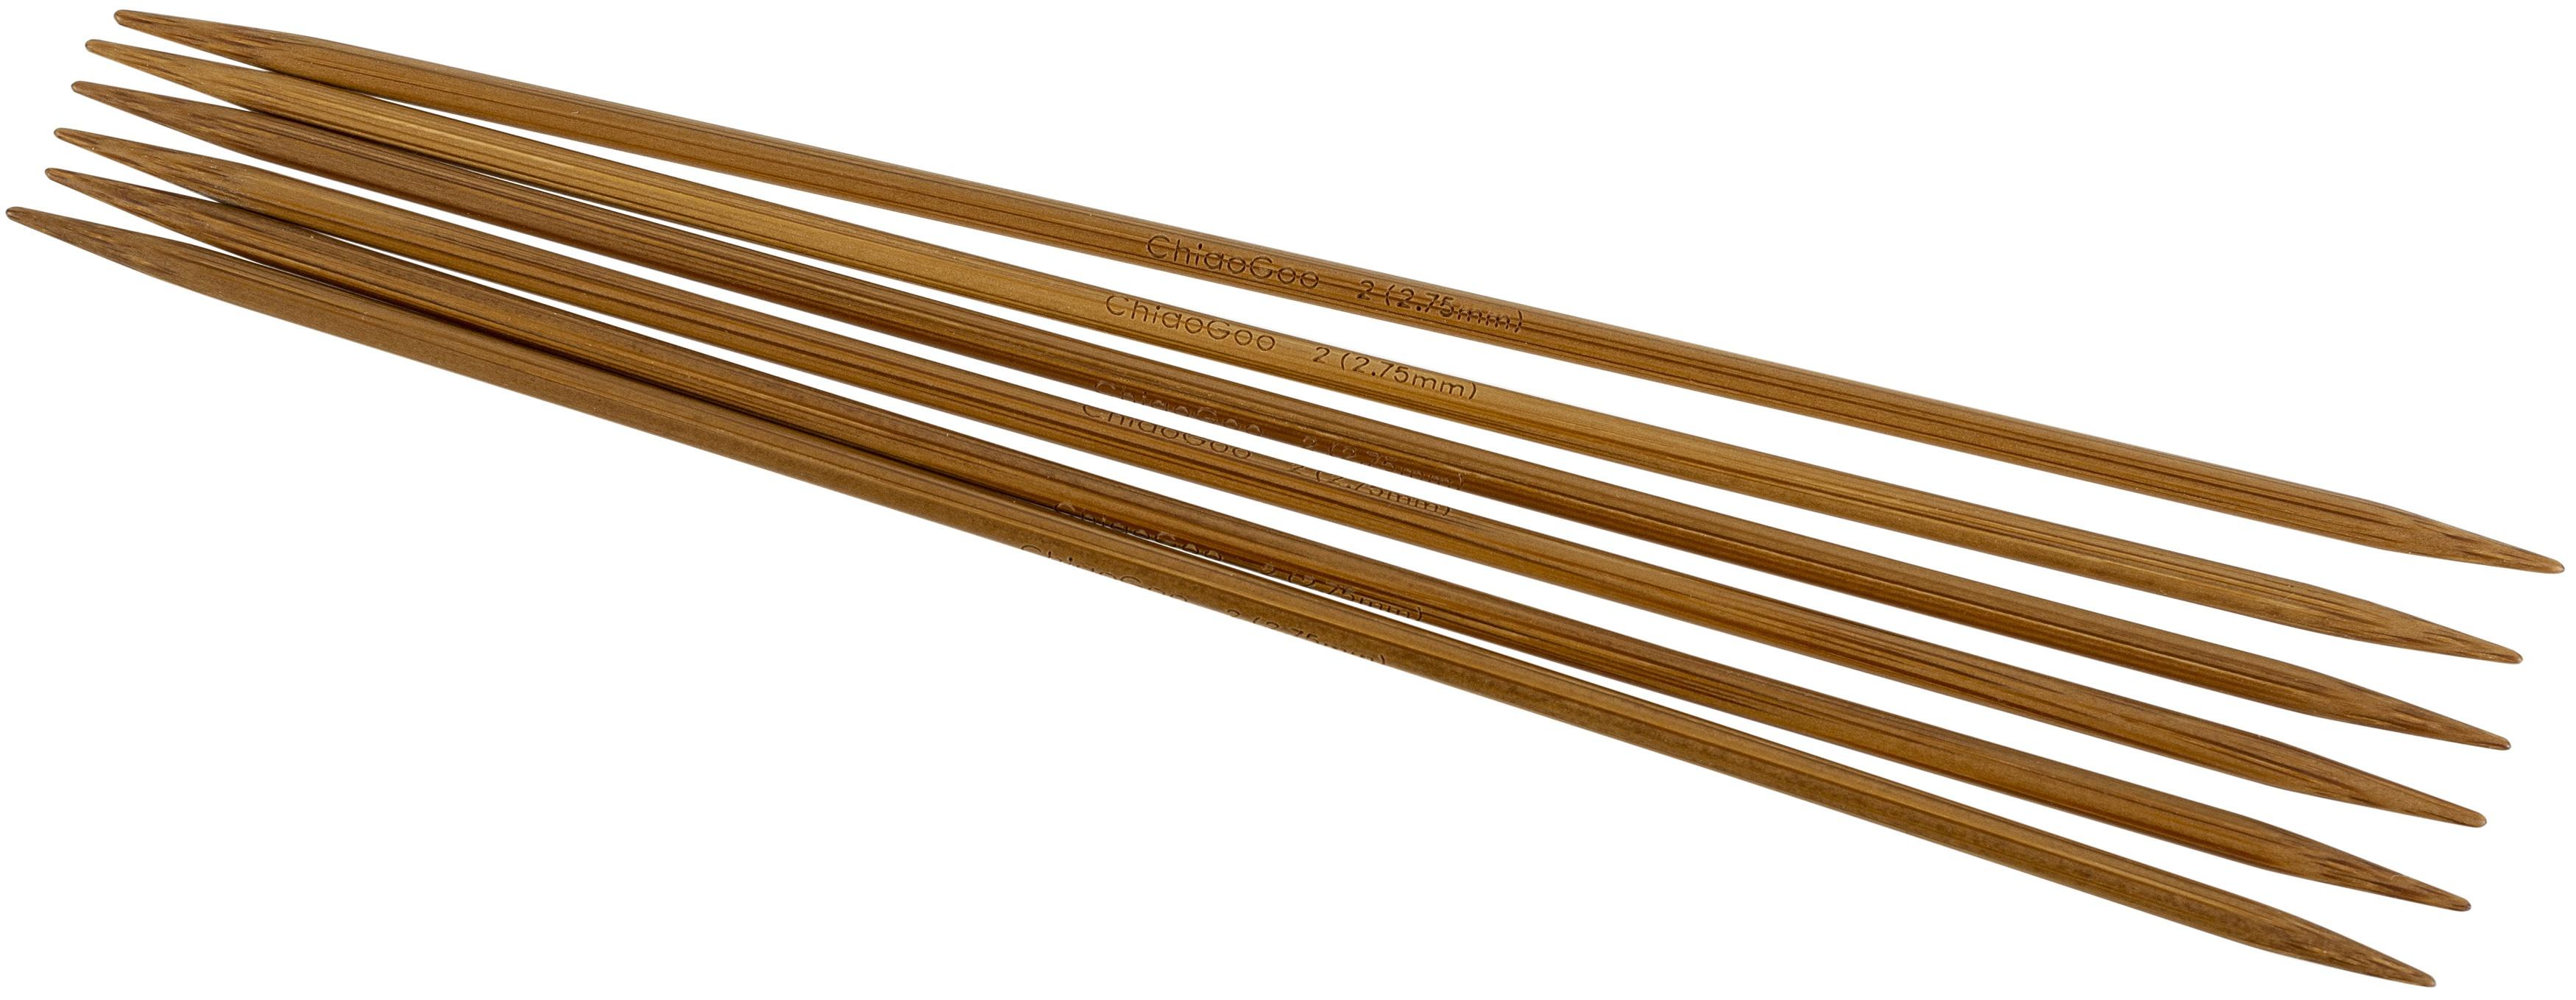 ChiaoGoo Bamboo 6 DPNS